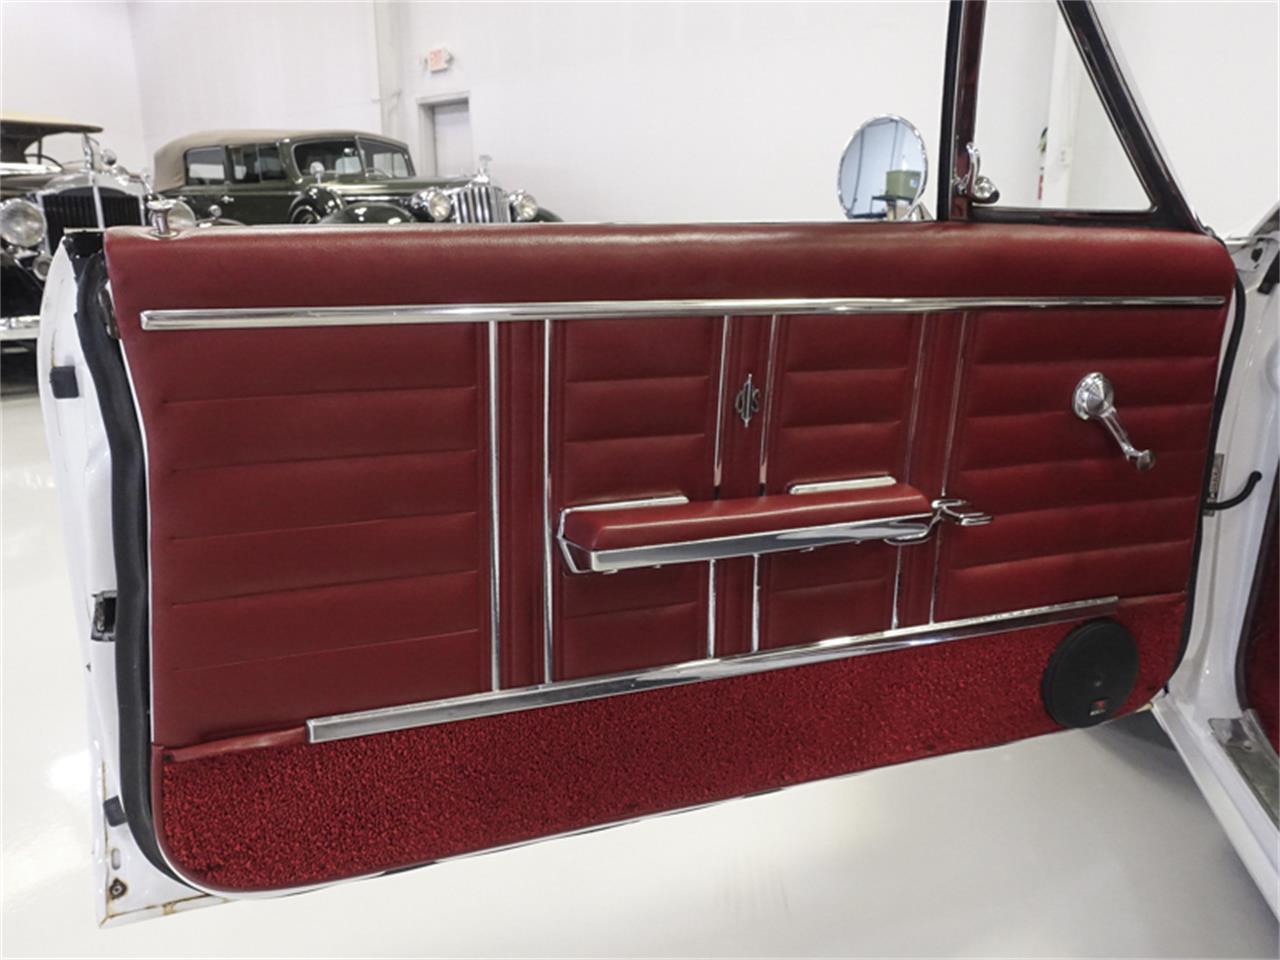 Large Picture of 1967 Oldsmobile Cutlass Supreme located in Missouri - QK0F